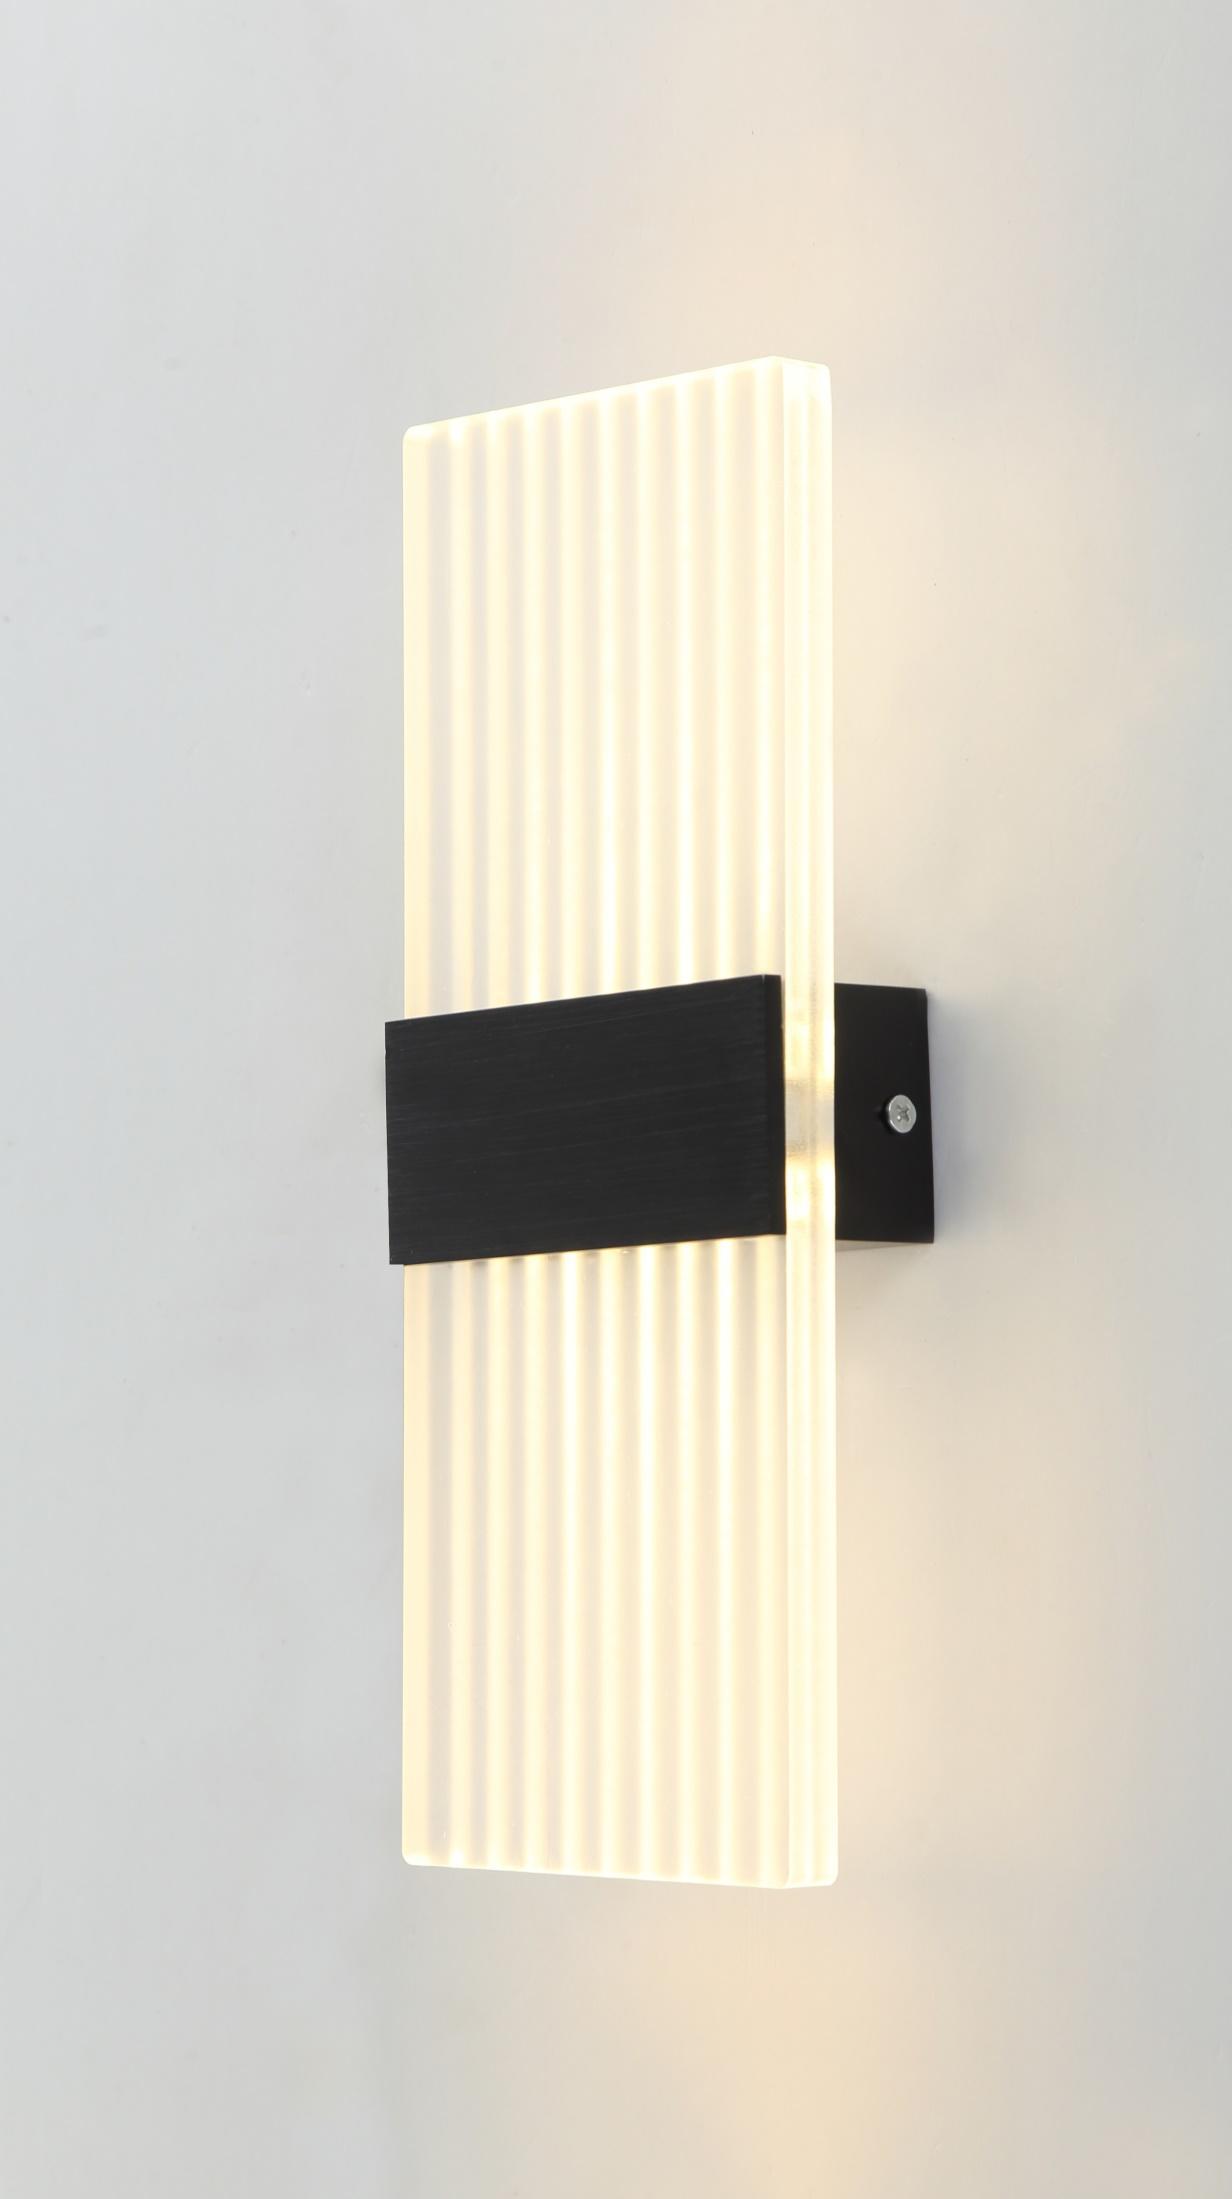 6W LED WALL LAMP 63922-1A